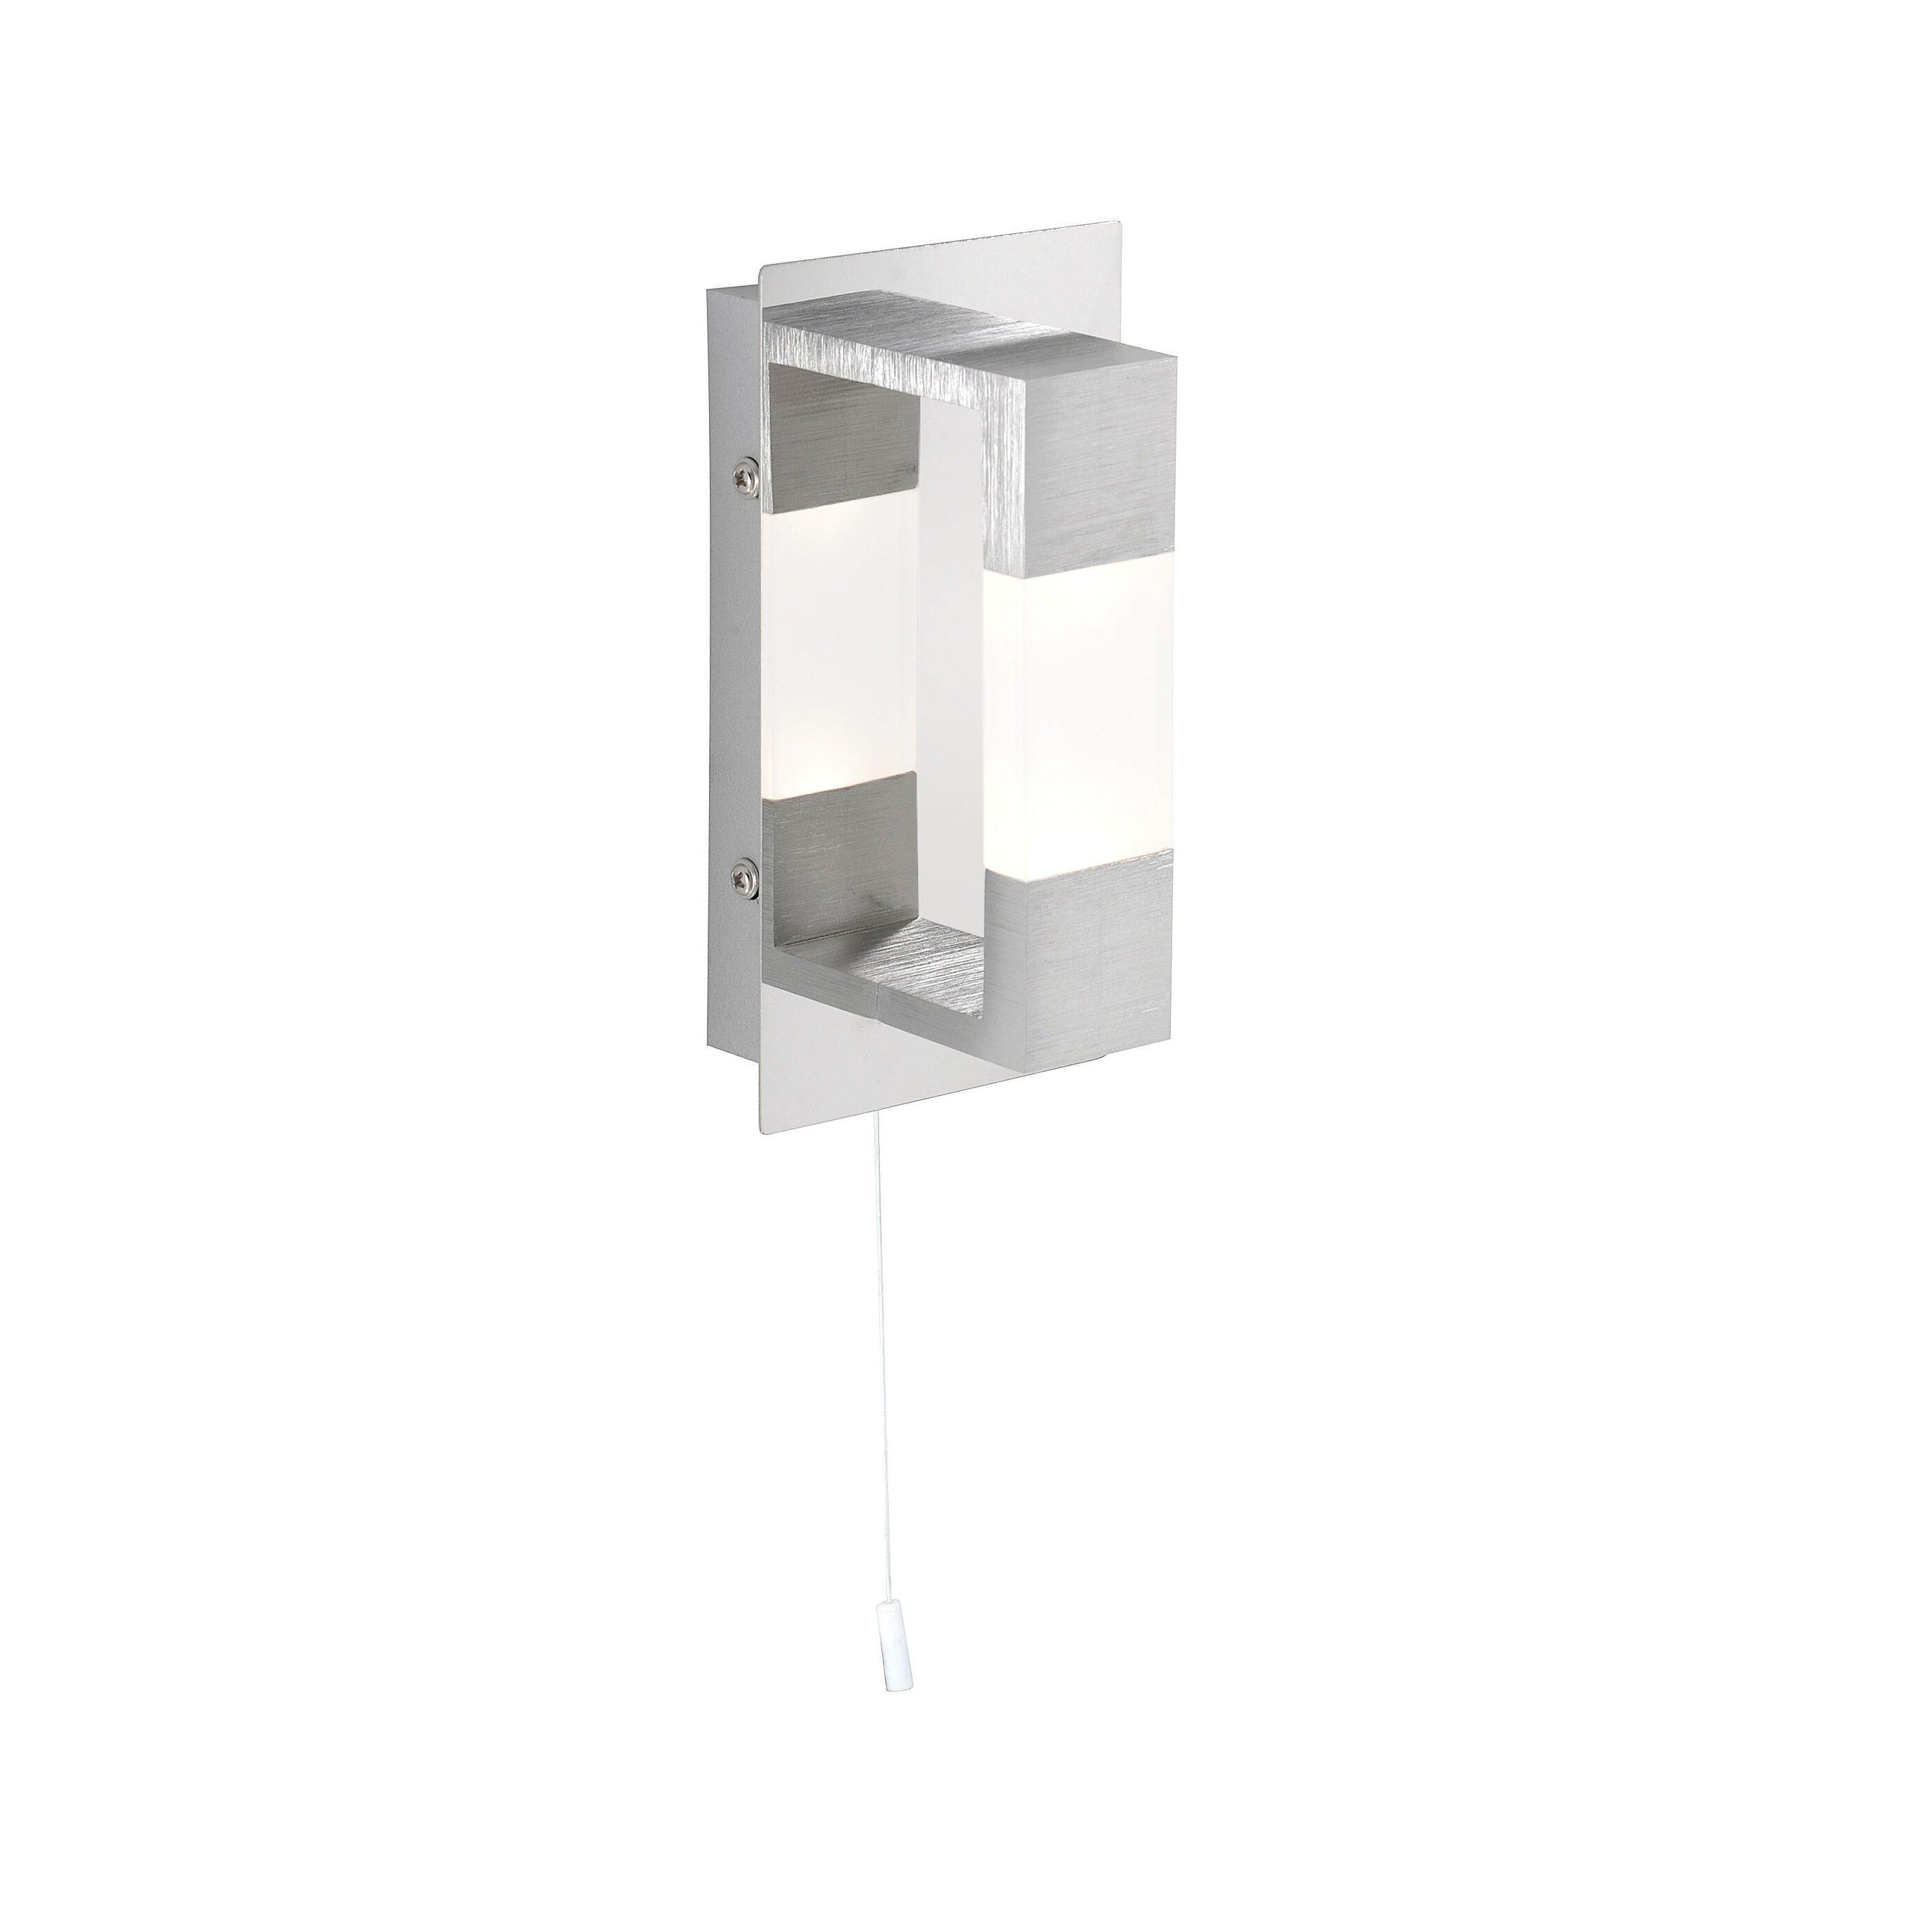 paul neuhaus design wandleuchte 2 flammig kemos. Black Bedroom Furniture Sets. Home Design Ideas